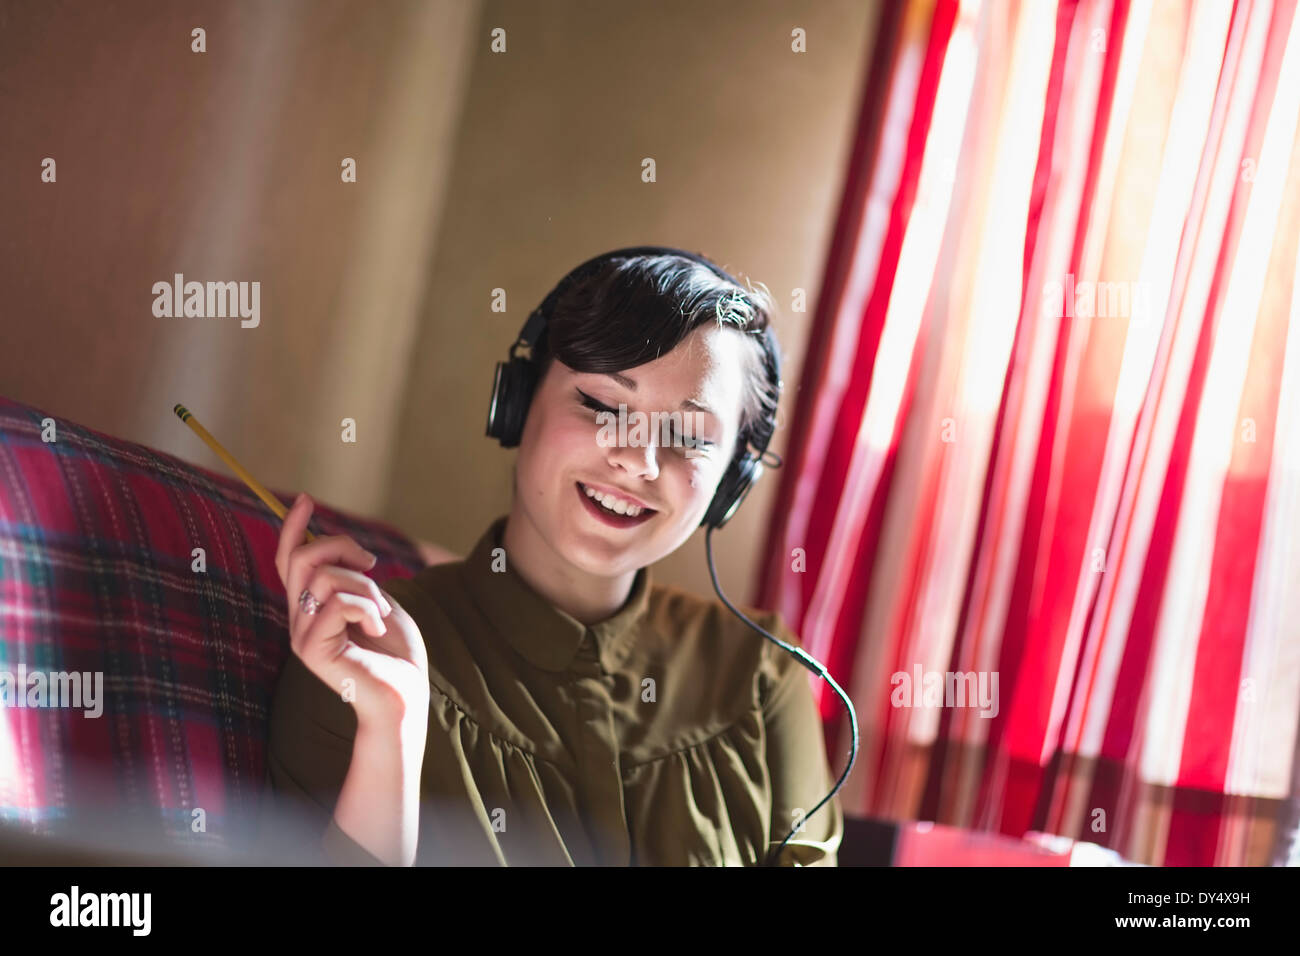 Mujer joven escuchando música Imagen De Stock